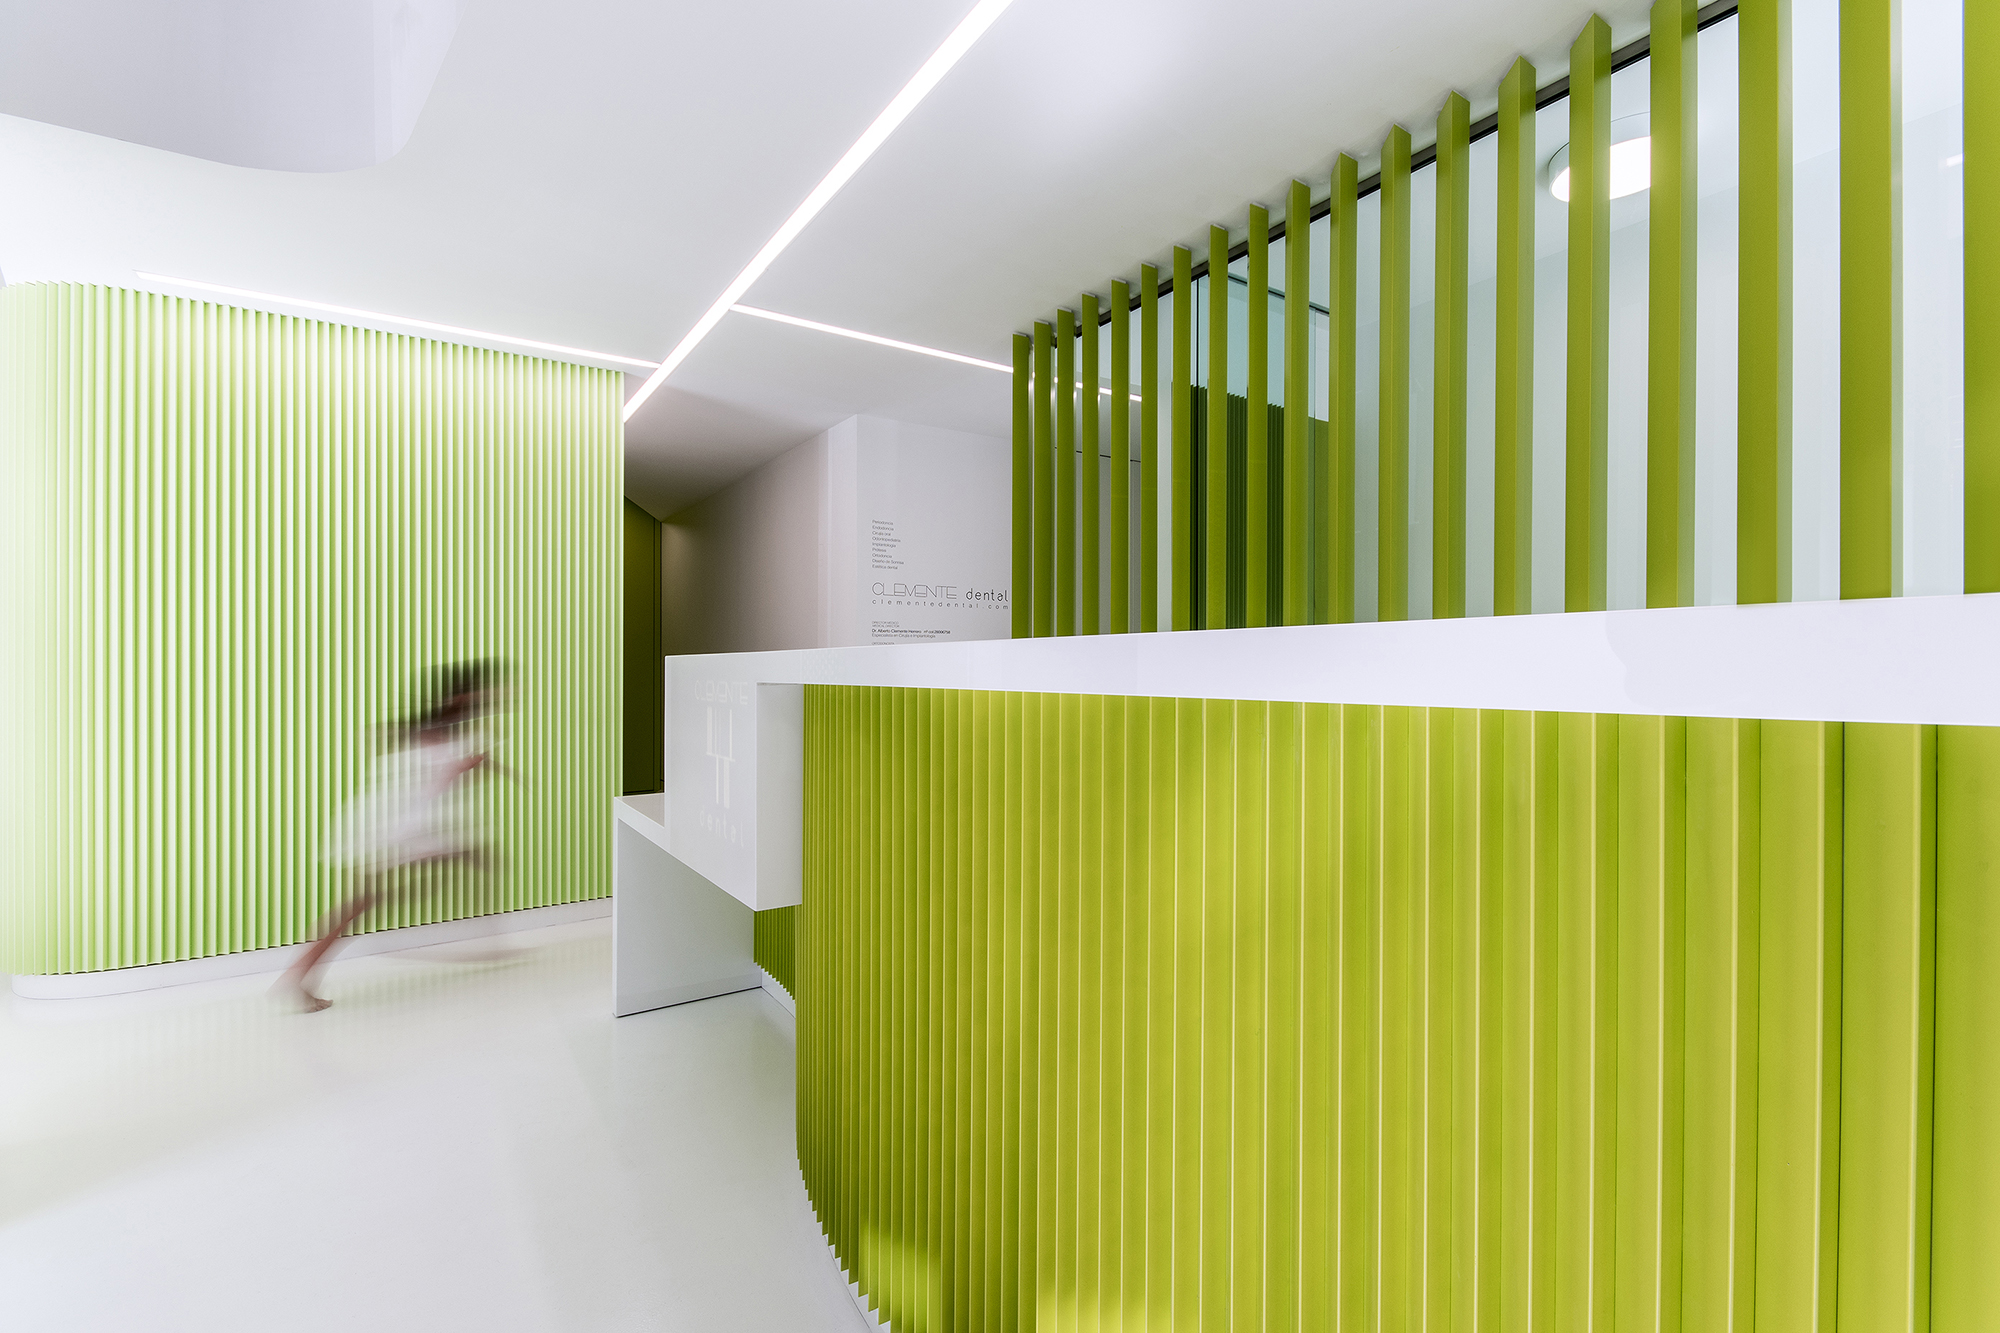 CLINICA CLEMENTE dental - LANDÍNEZ+REY arquitectos - arquitectura retail - interiorismo recepción